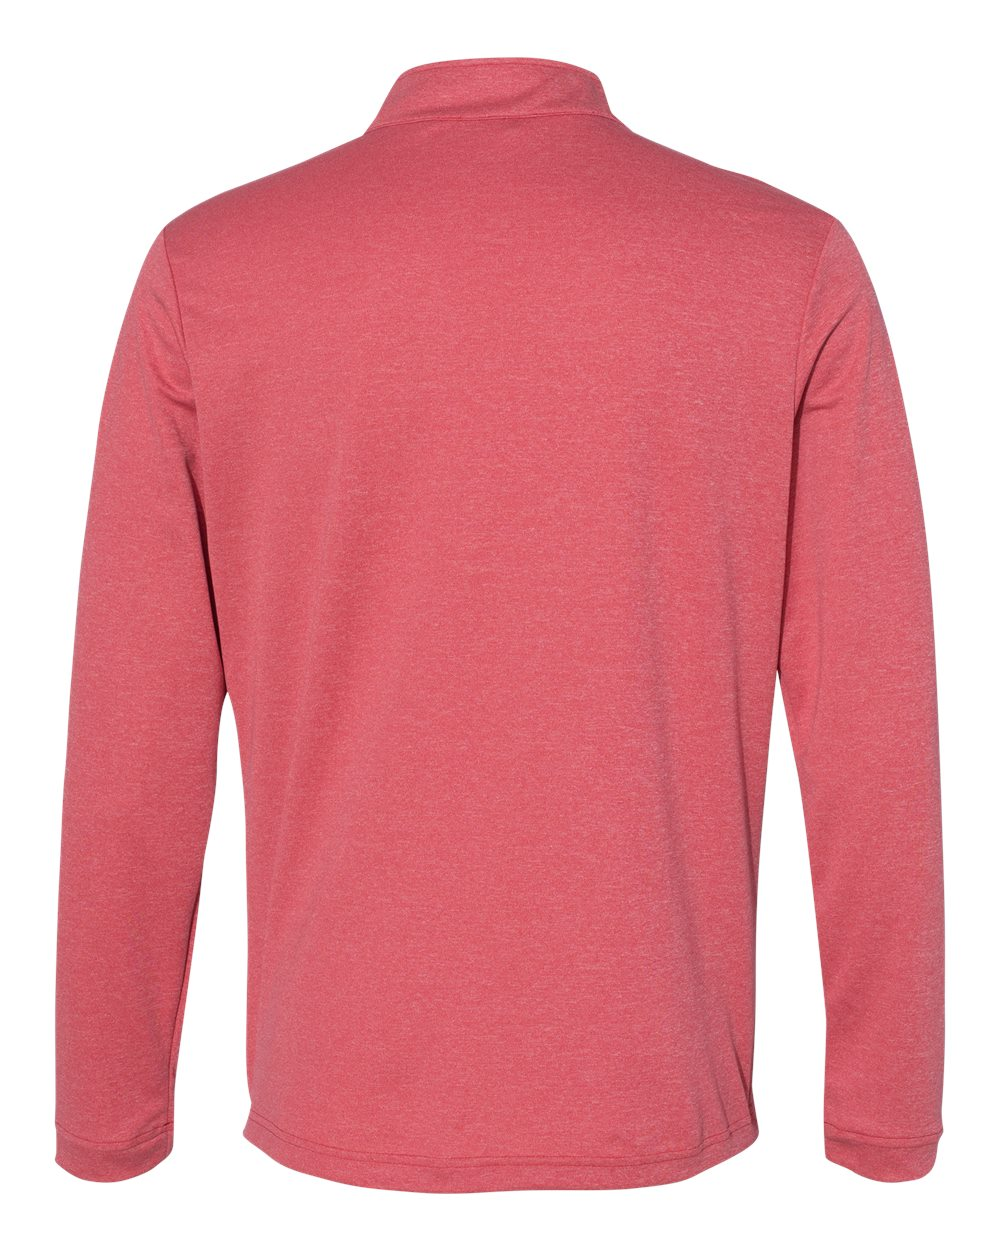 Adidas-Mens-Lightweight-UPF-pullover-Shirt-Warmup-A280-up-to-4XL thumbnail 19